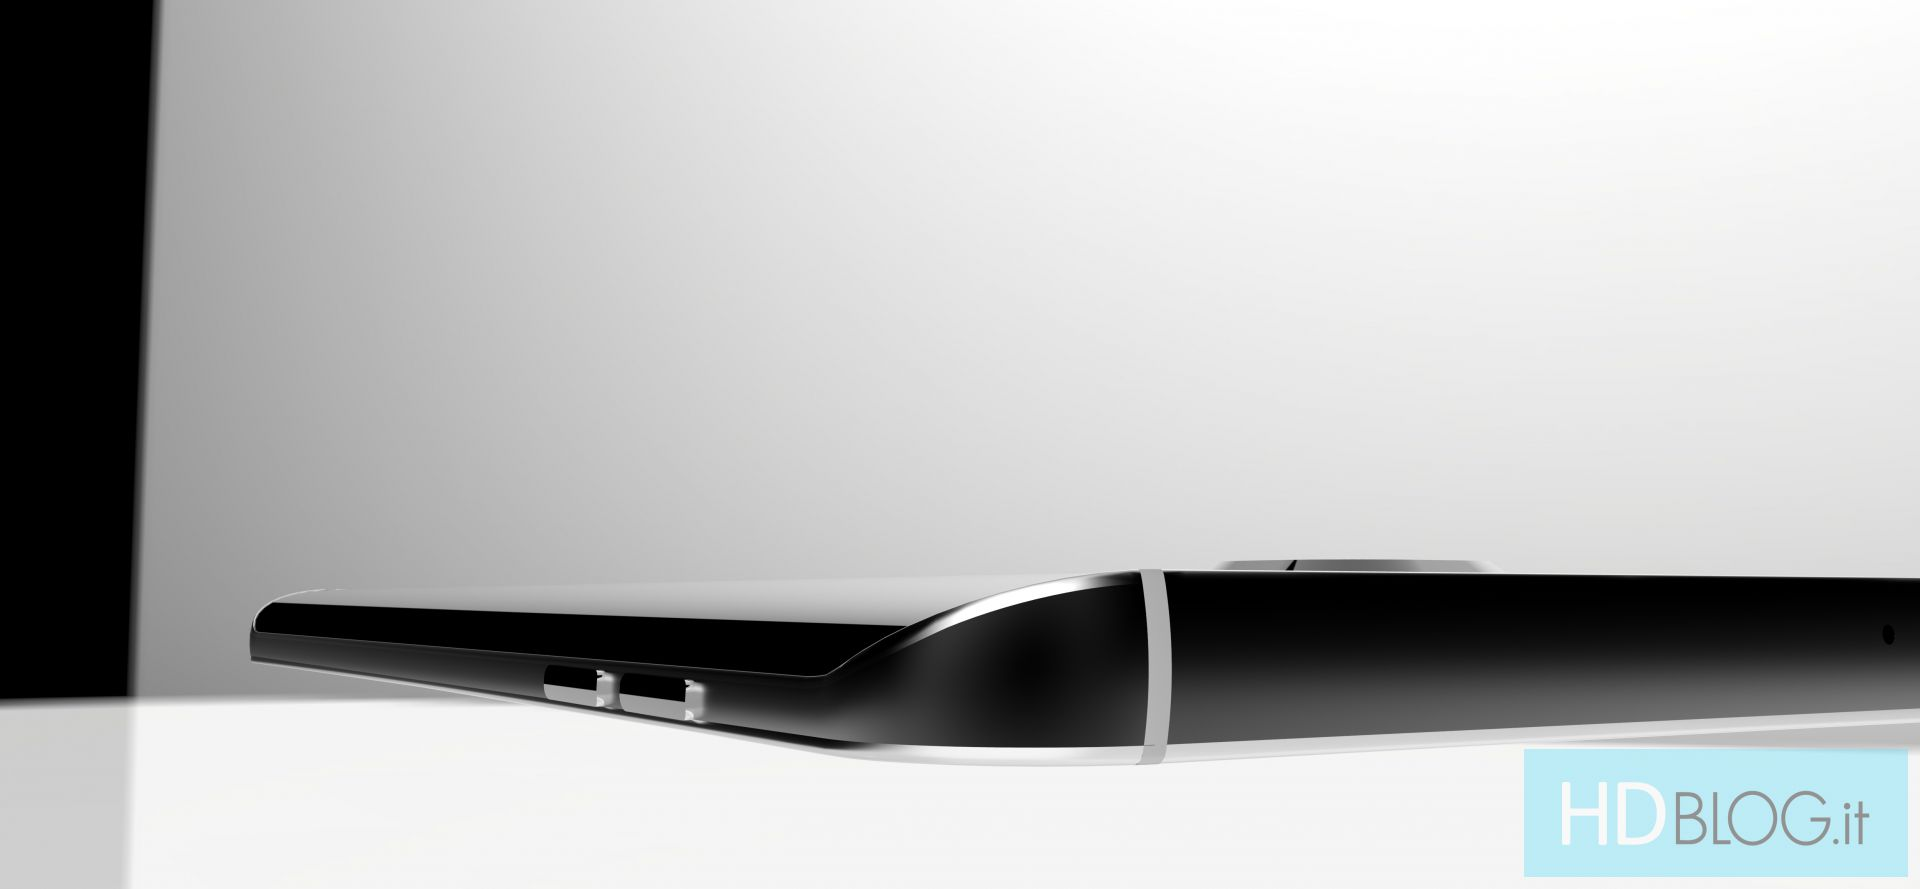 Galaxy-Note-5-schematics-and-concept-renders-14.jpg